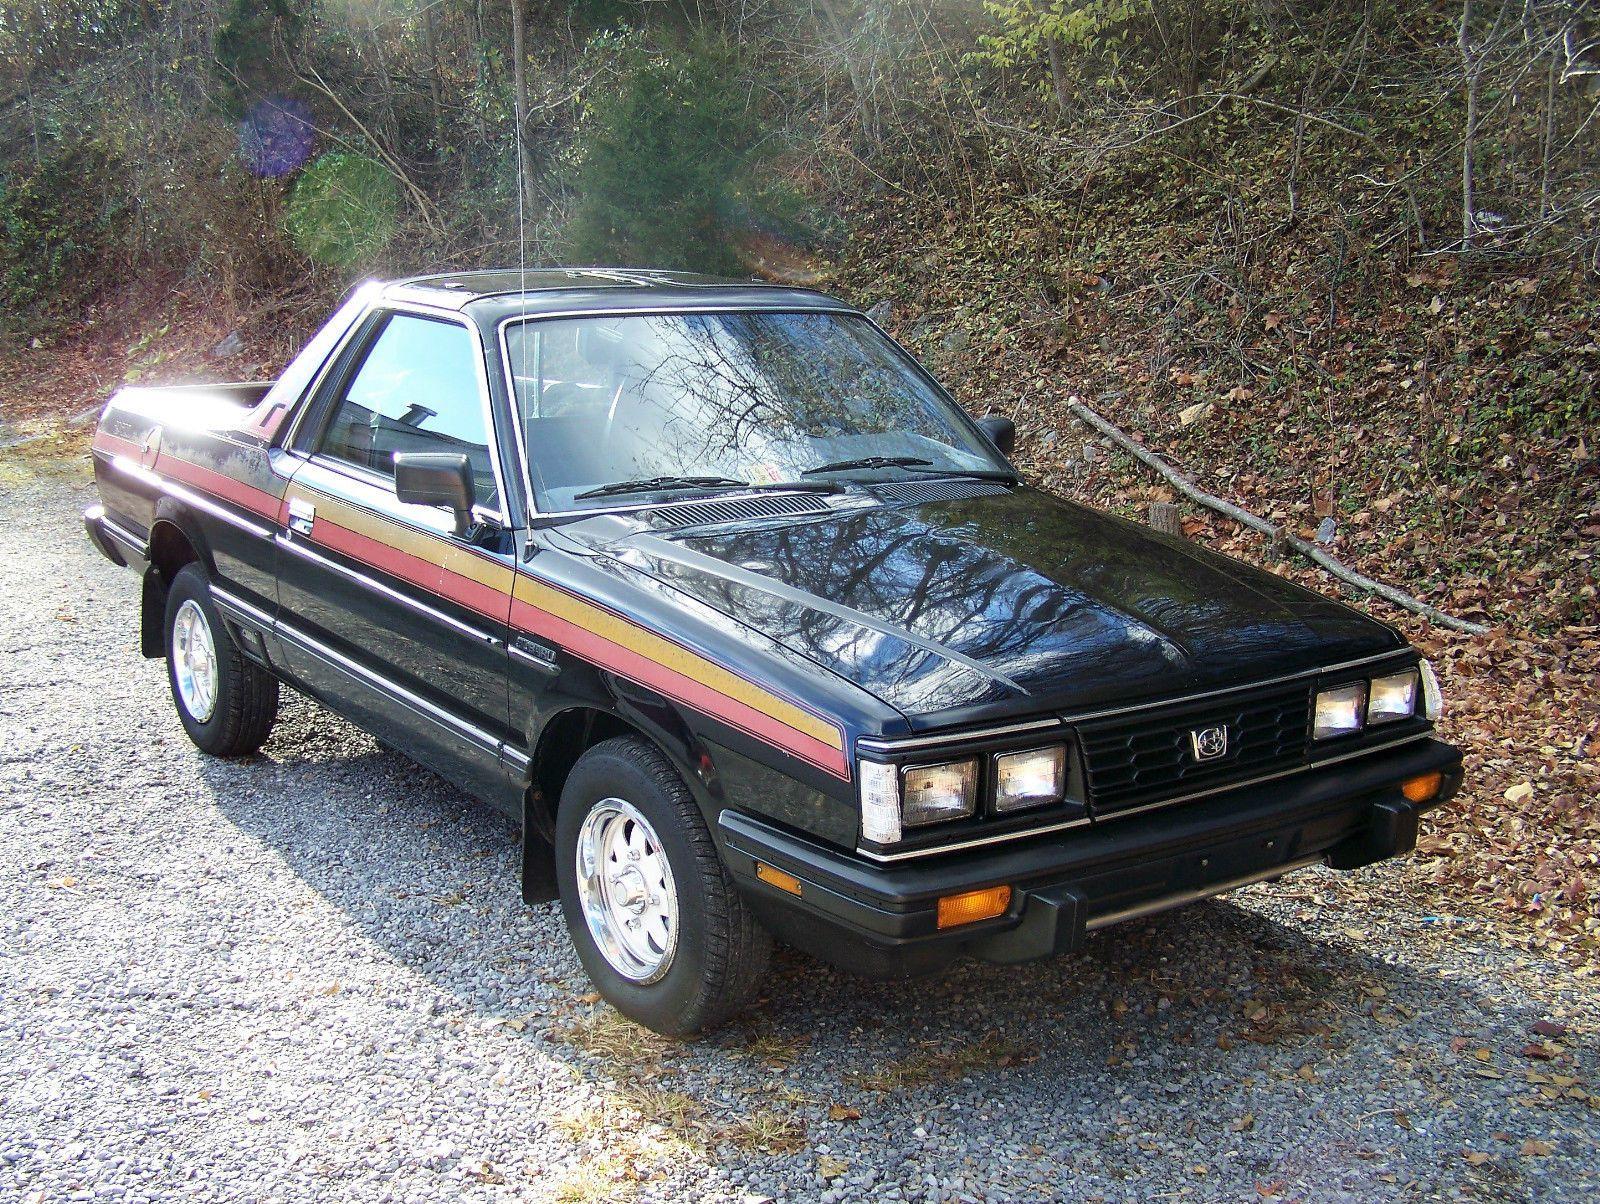 1984 Subaru BRAT GL 4X4 Low Mileage Survivor for sale Vintage